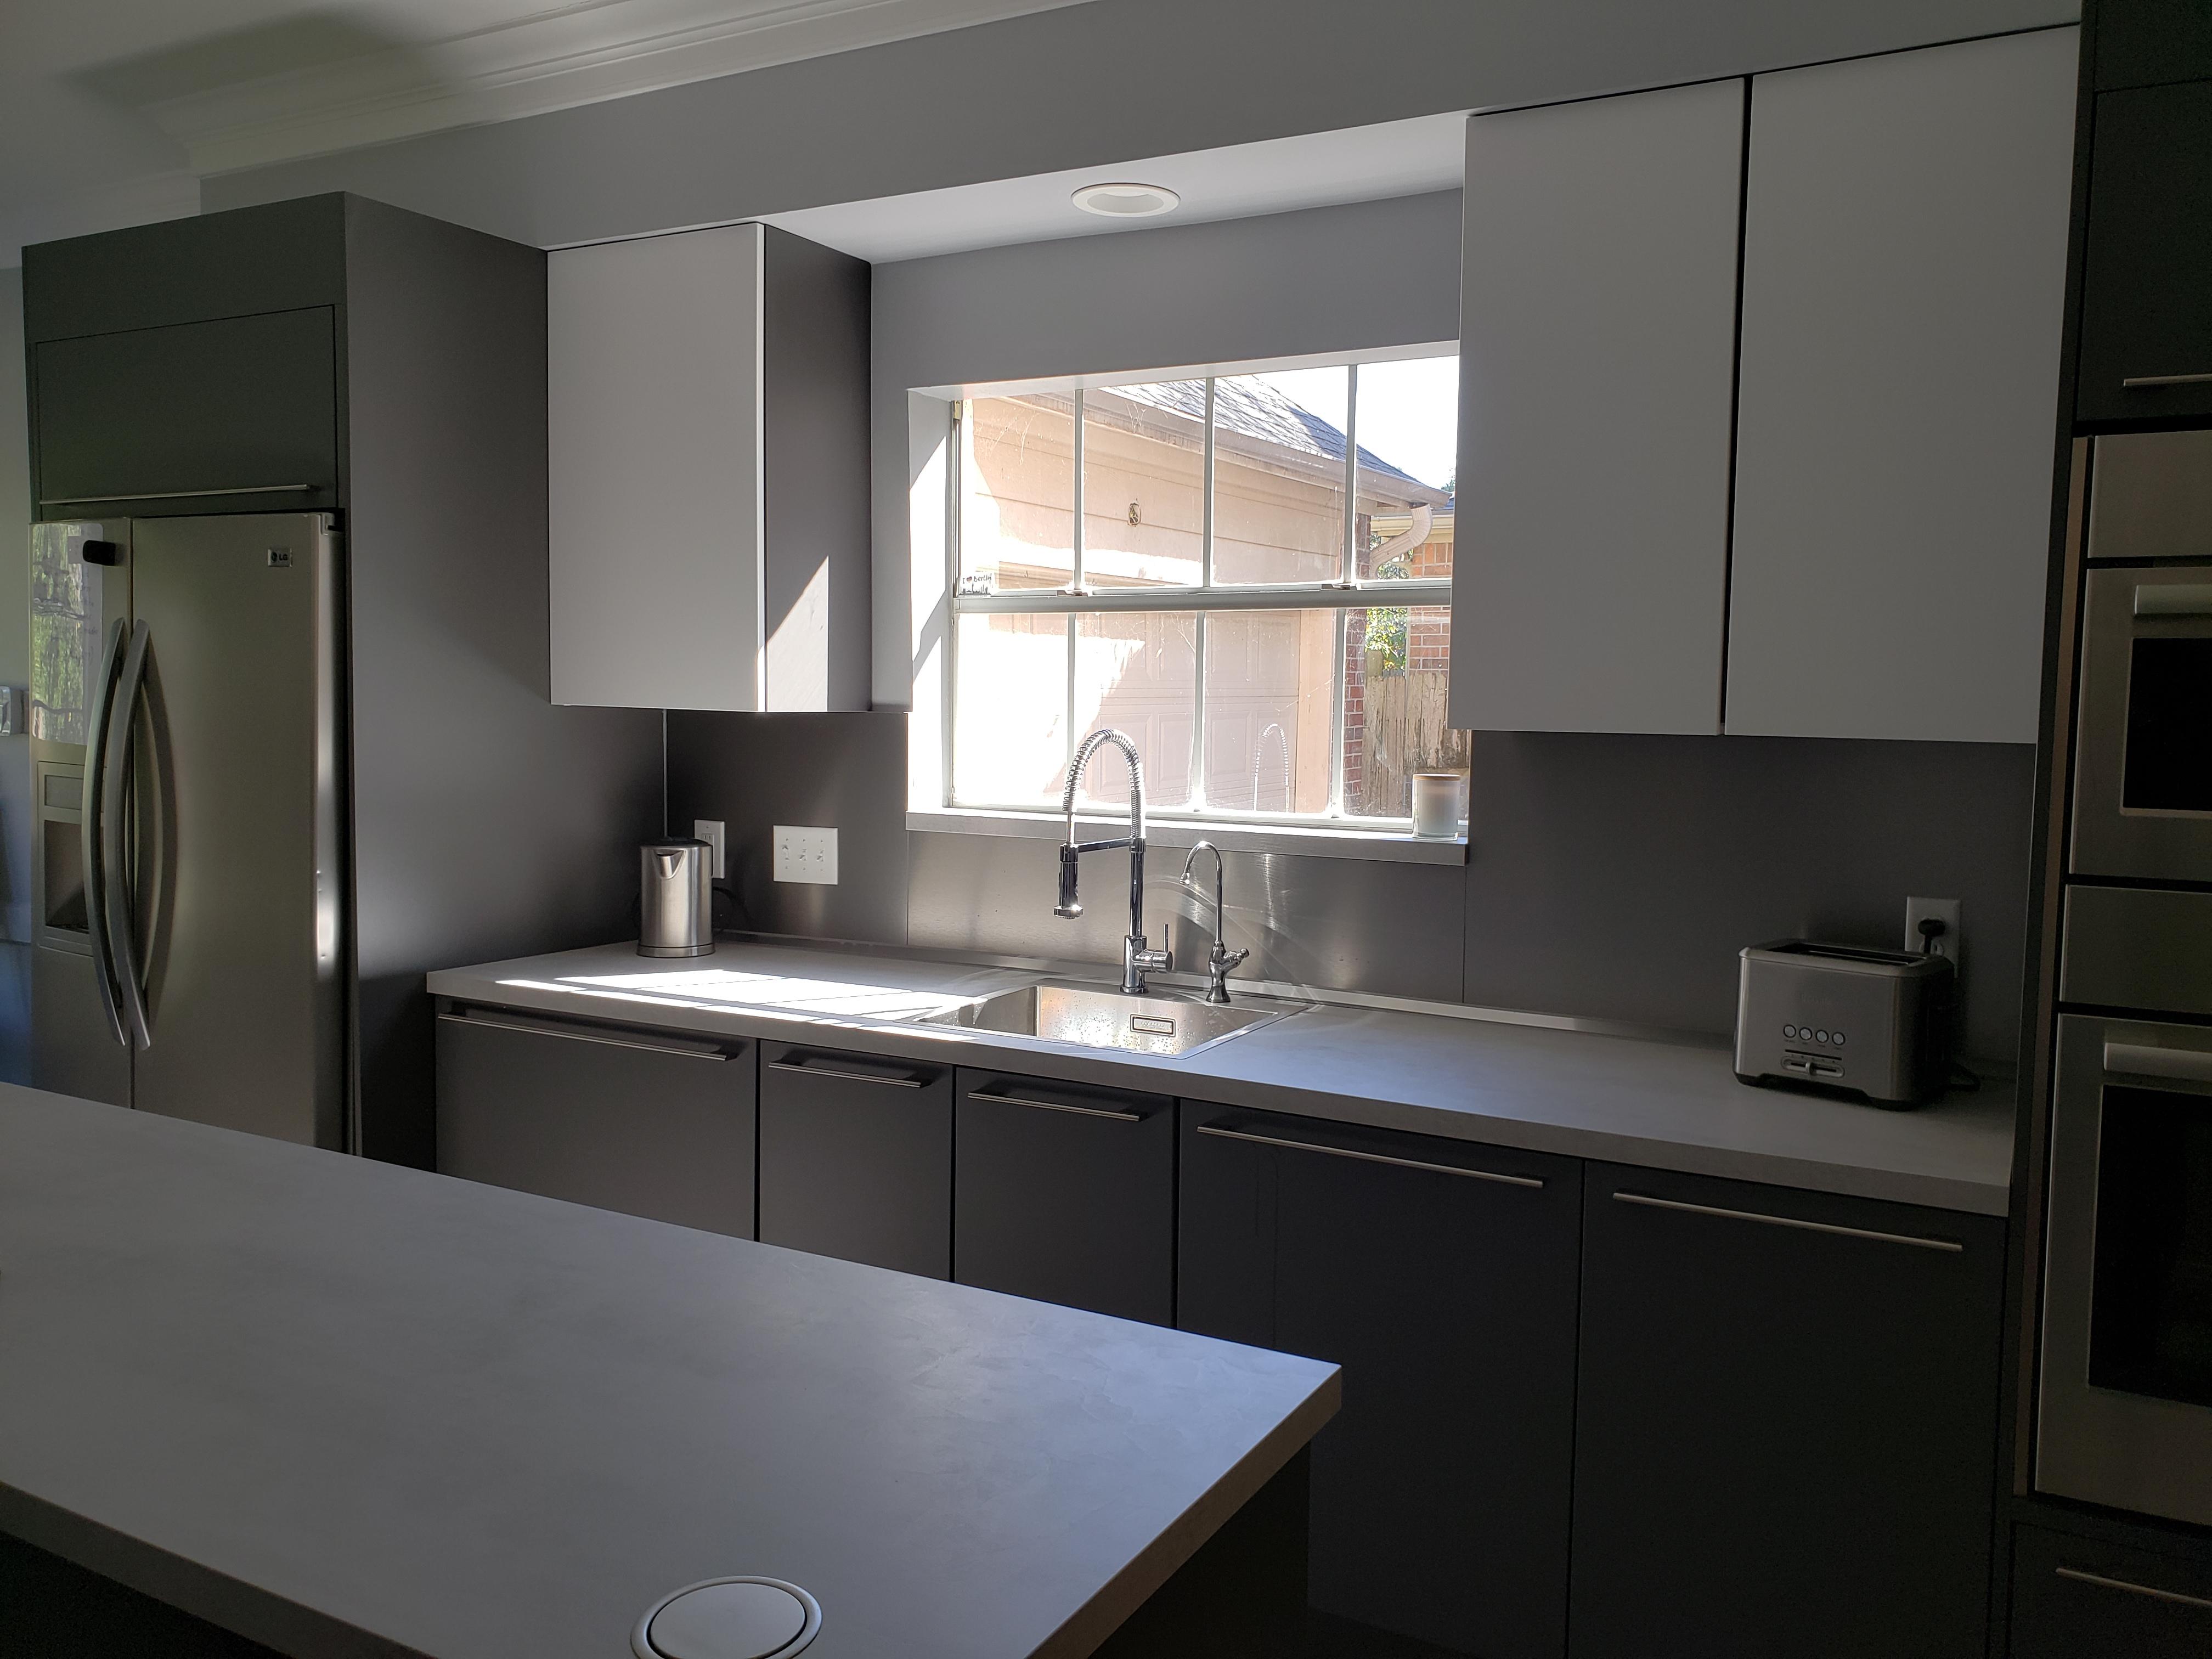 german kitchen cabinets, Katy/TX